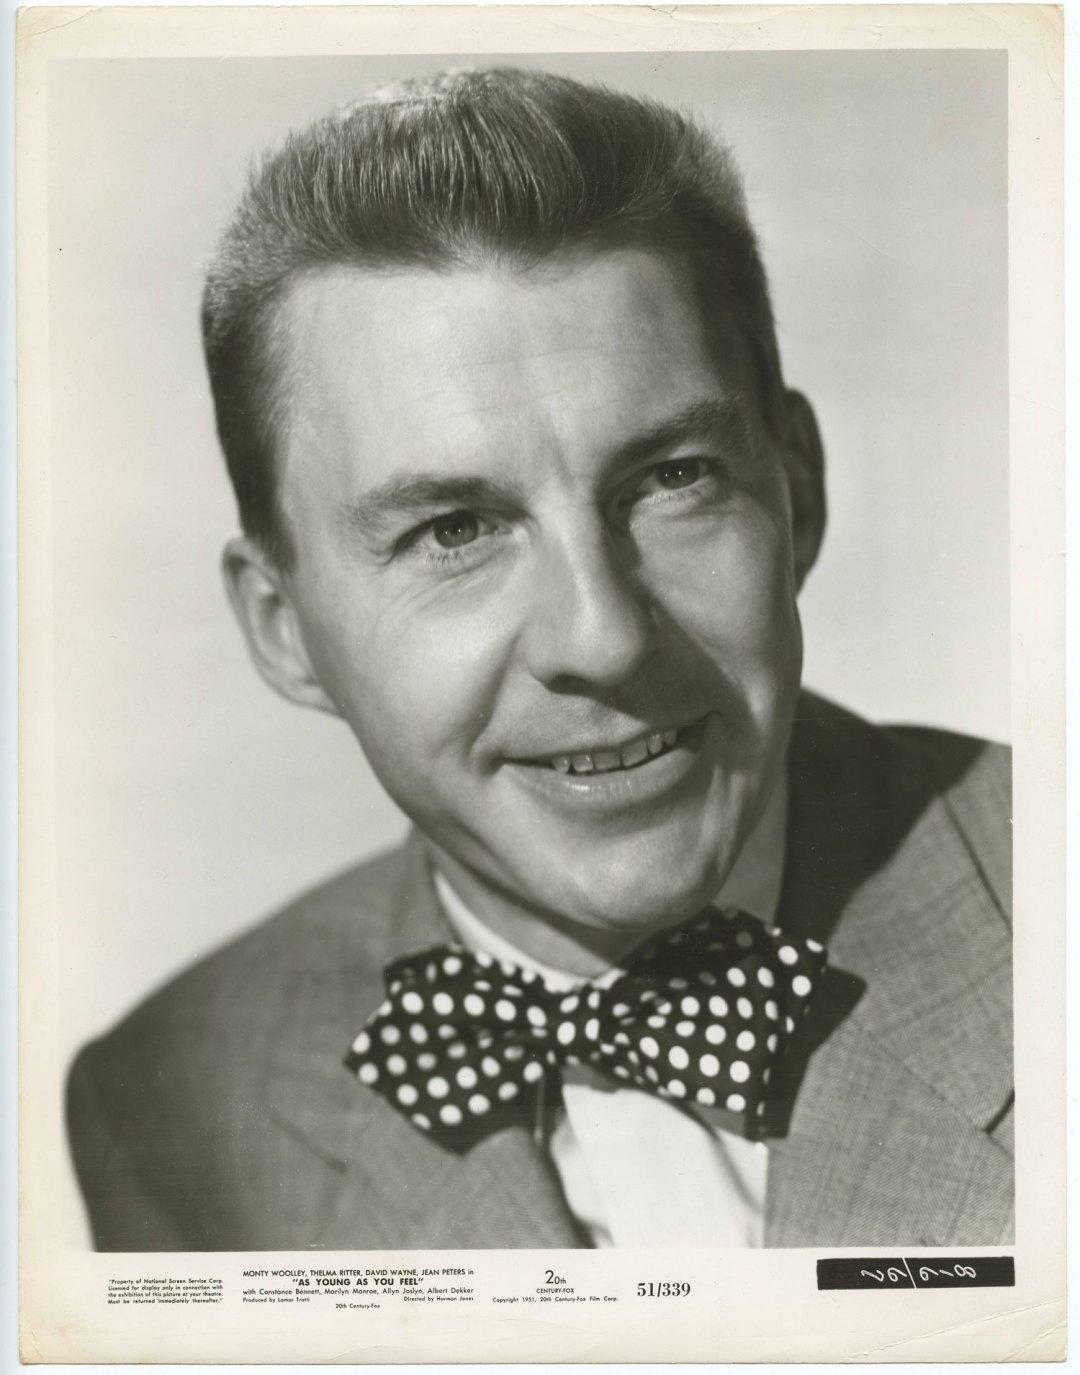 David Wayne 1951 As Young As You Feel 8x10 Lobby Card 816/67